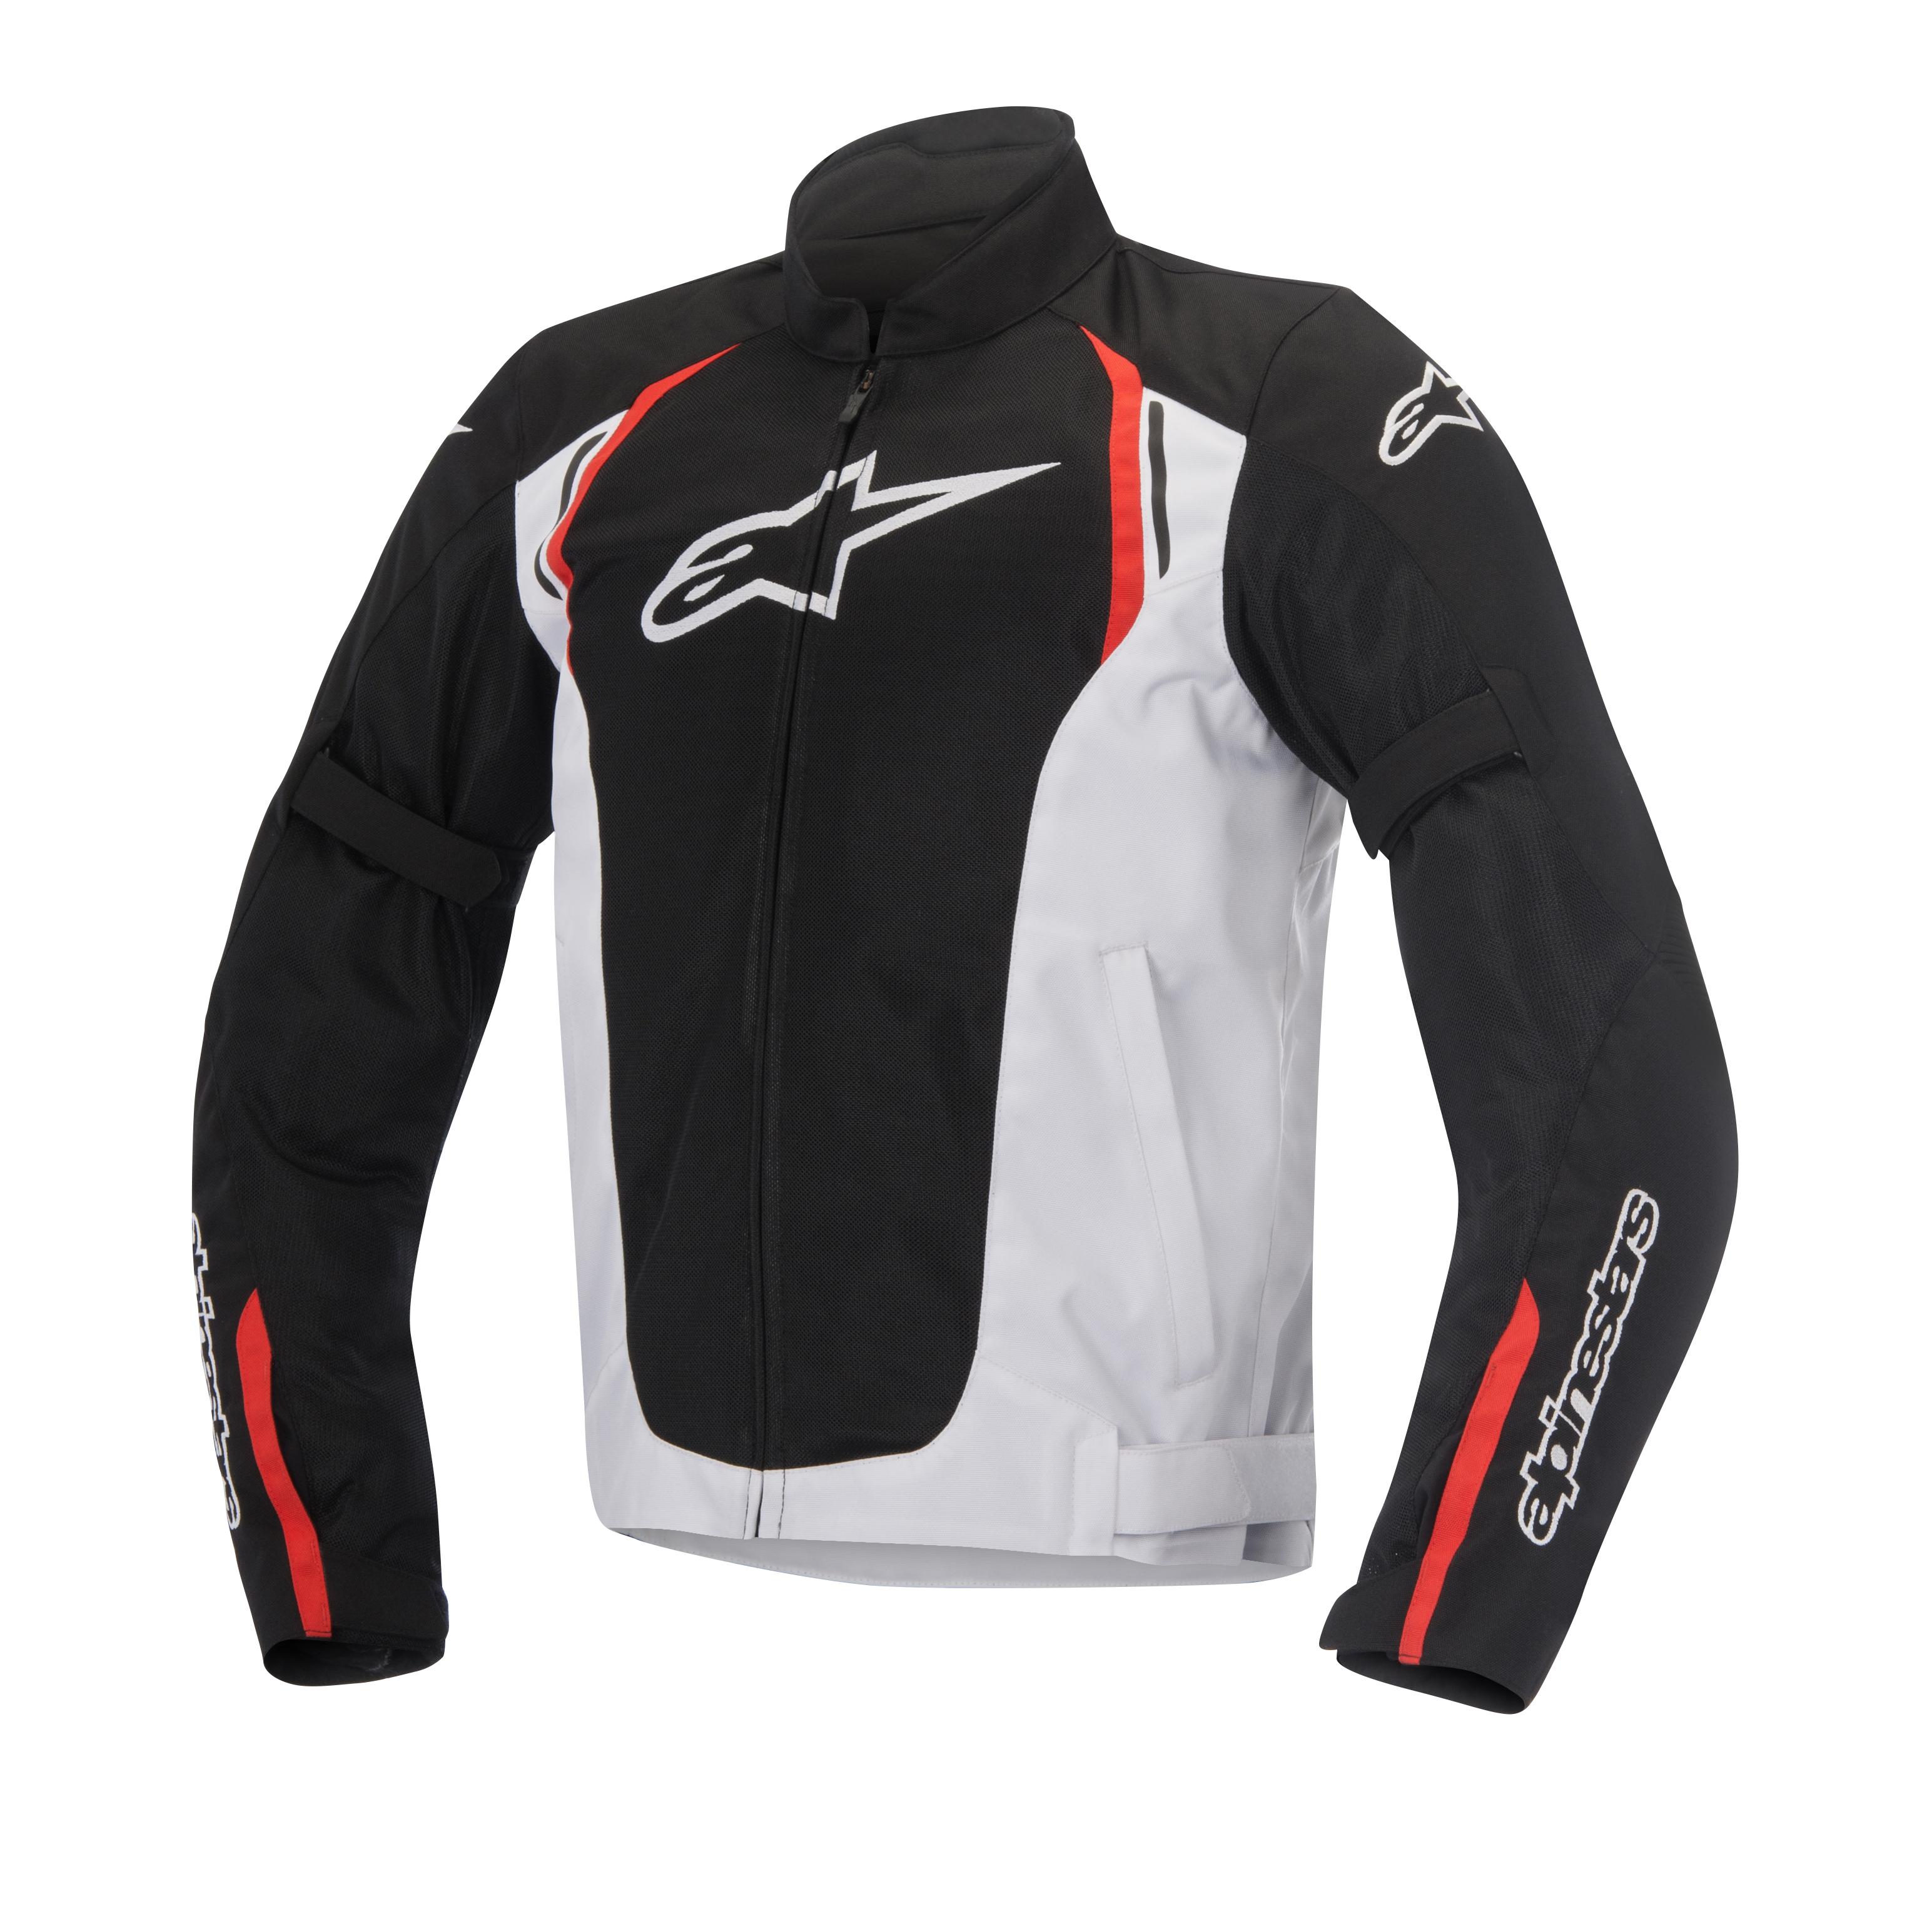 Giacca moto Alpinestars Ast Air TX nero bianco rosso